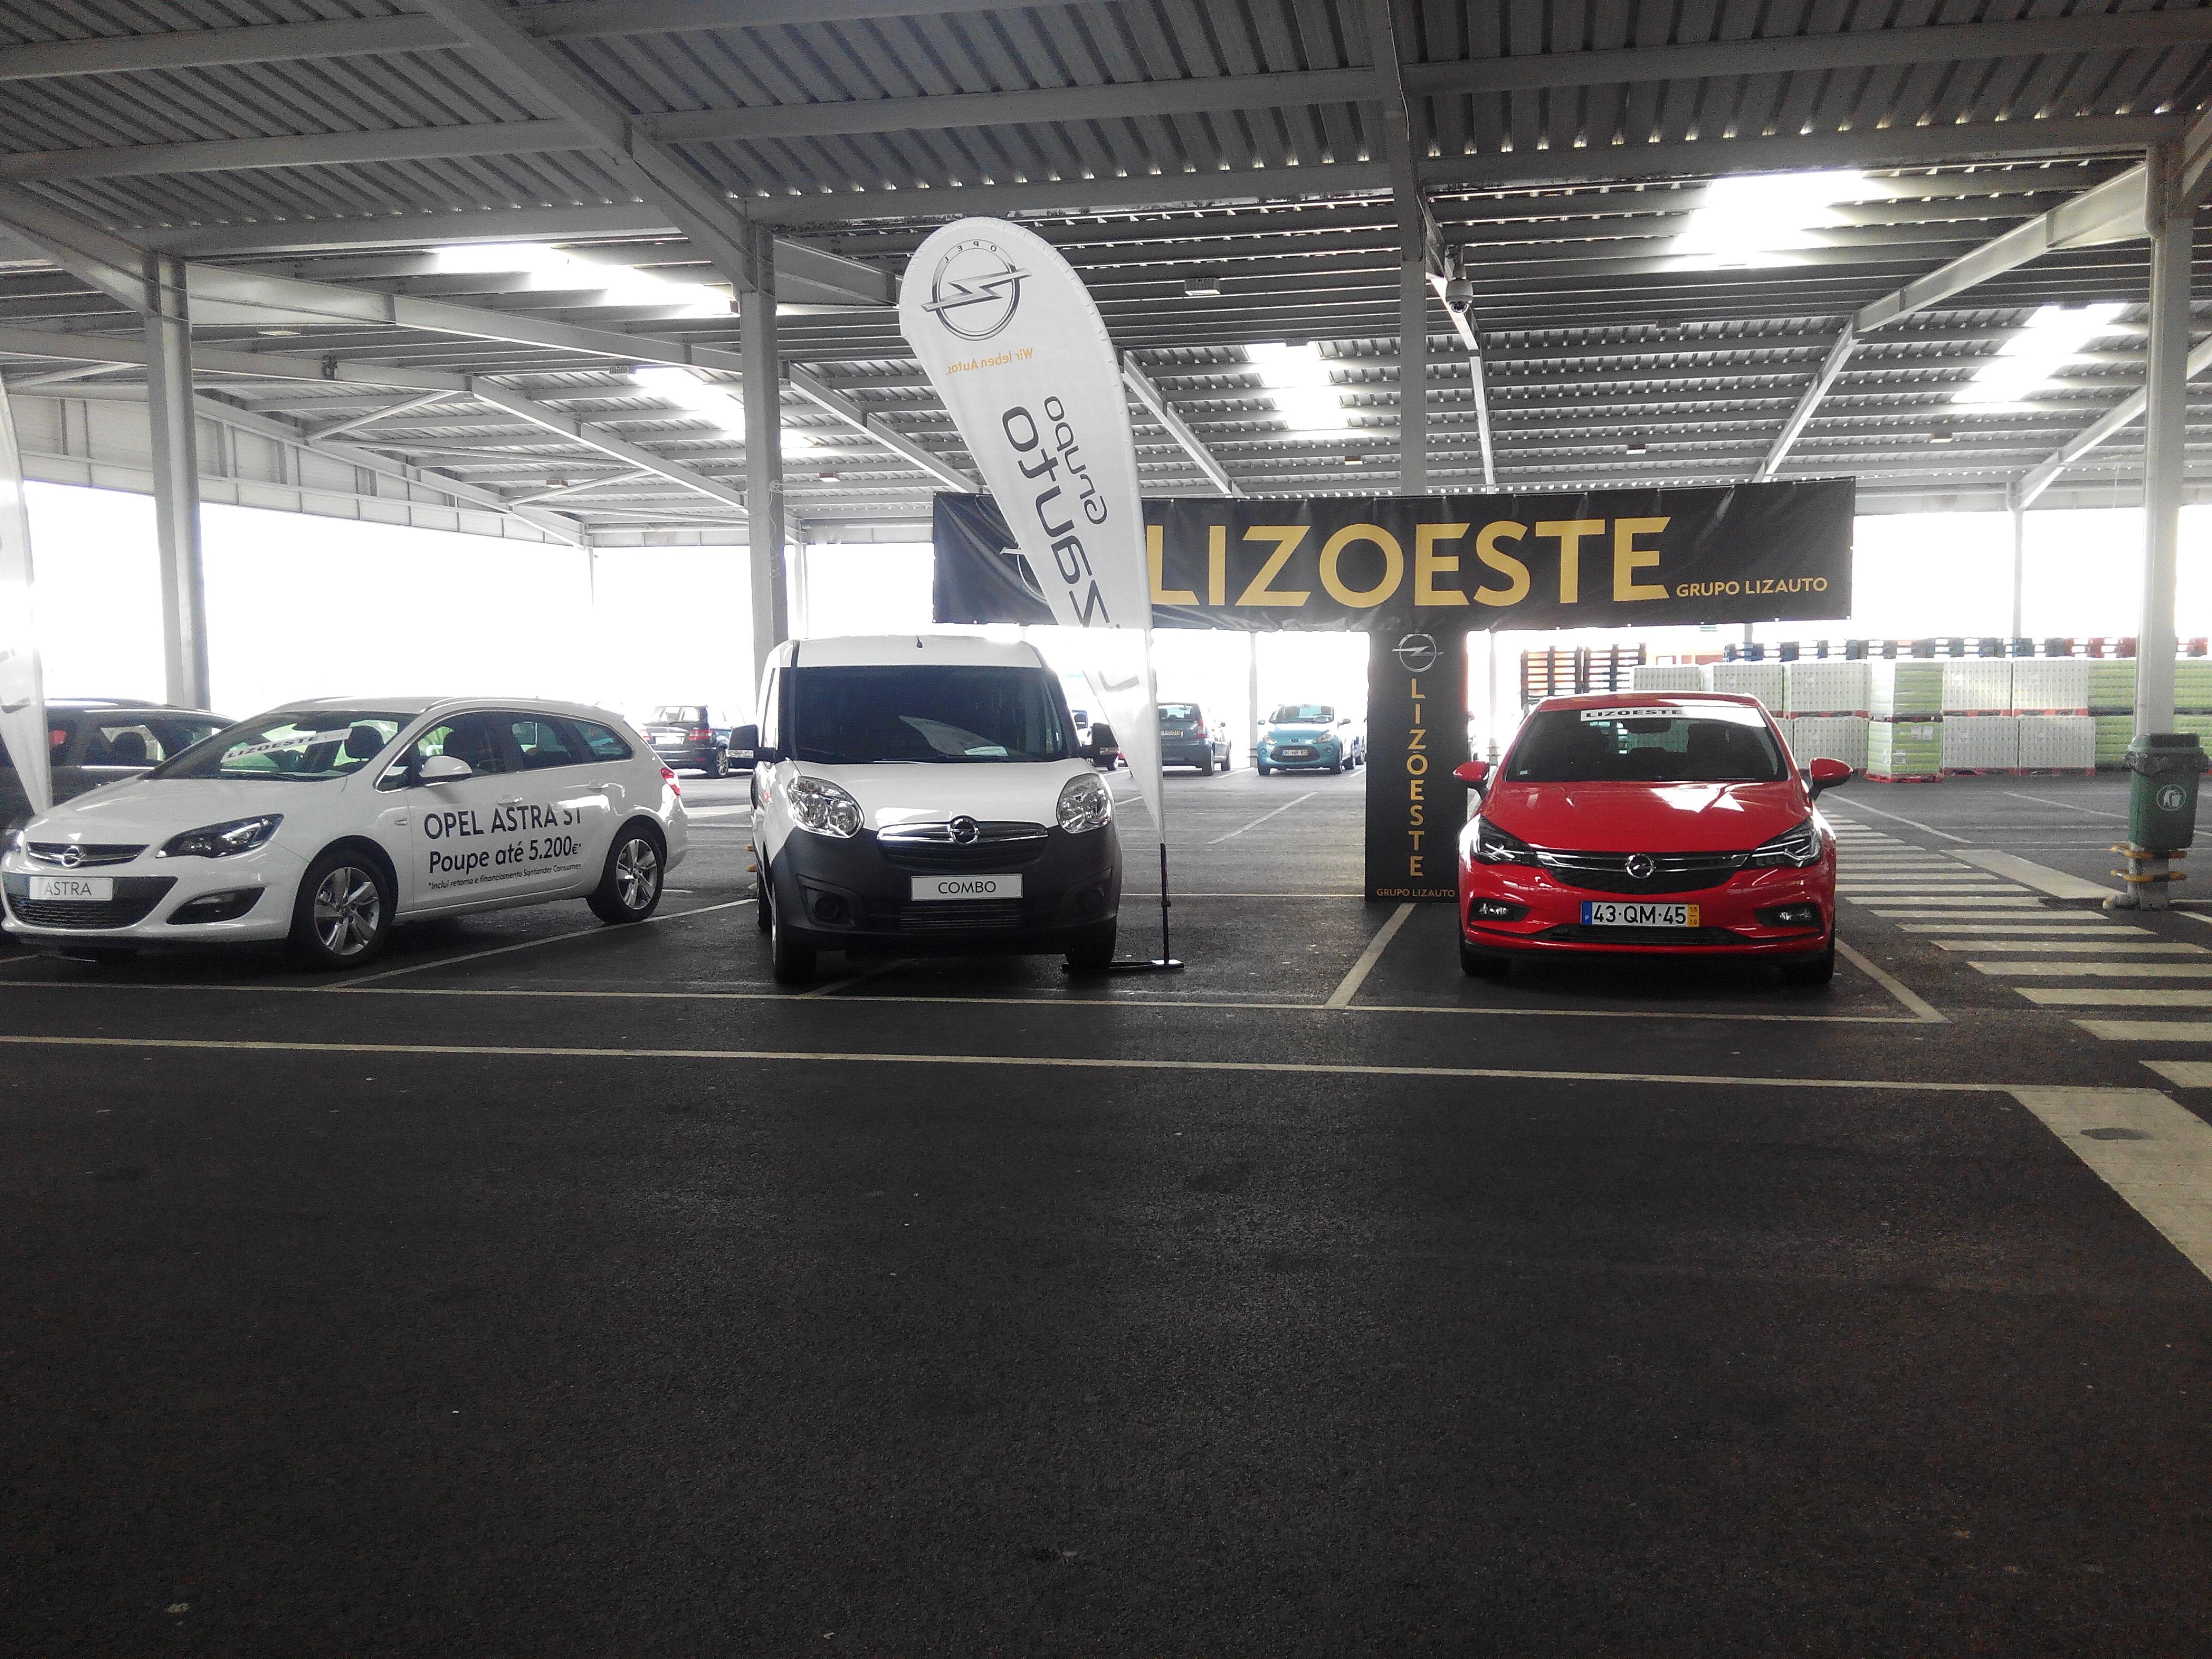 Opel_Lizoeste_RecheioViaturas_2015